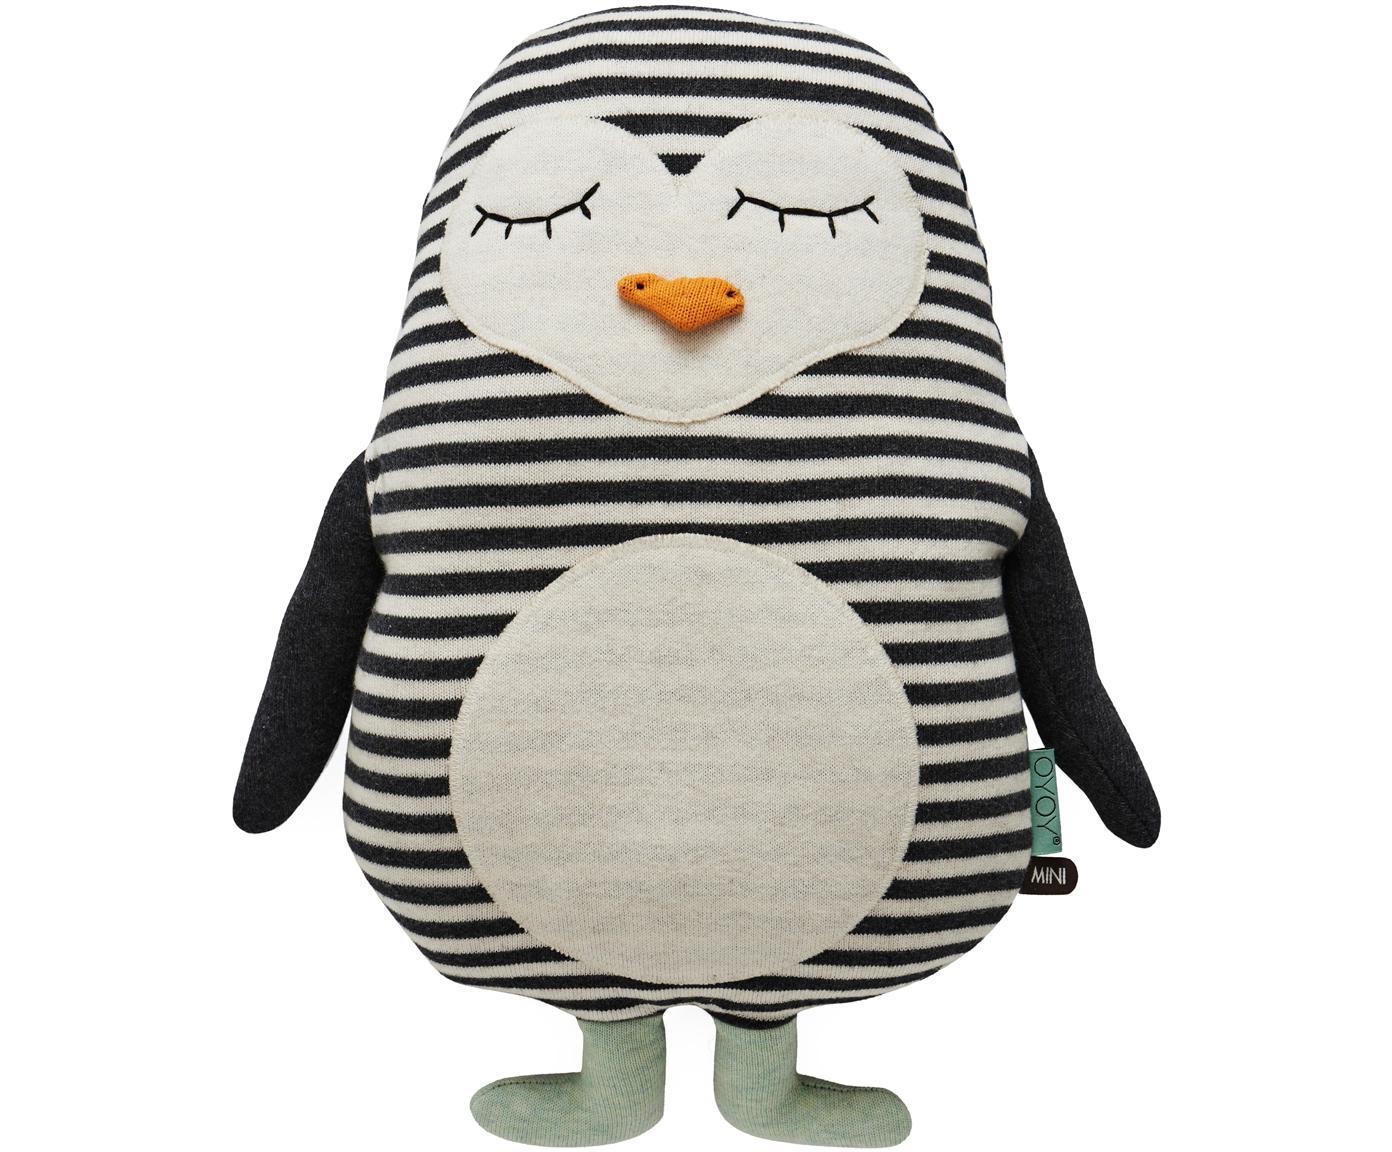 Peluche pinguino soffice Pingo, Cotone, Bianco latteo, nero, verde menta, arancione, Larg. 31 x Alt. 41 cm